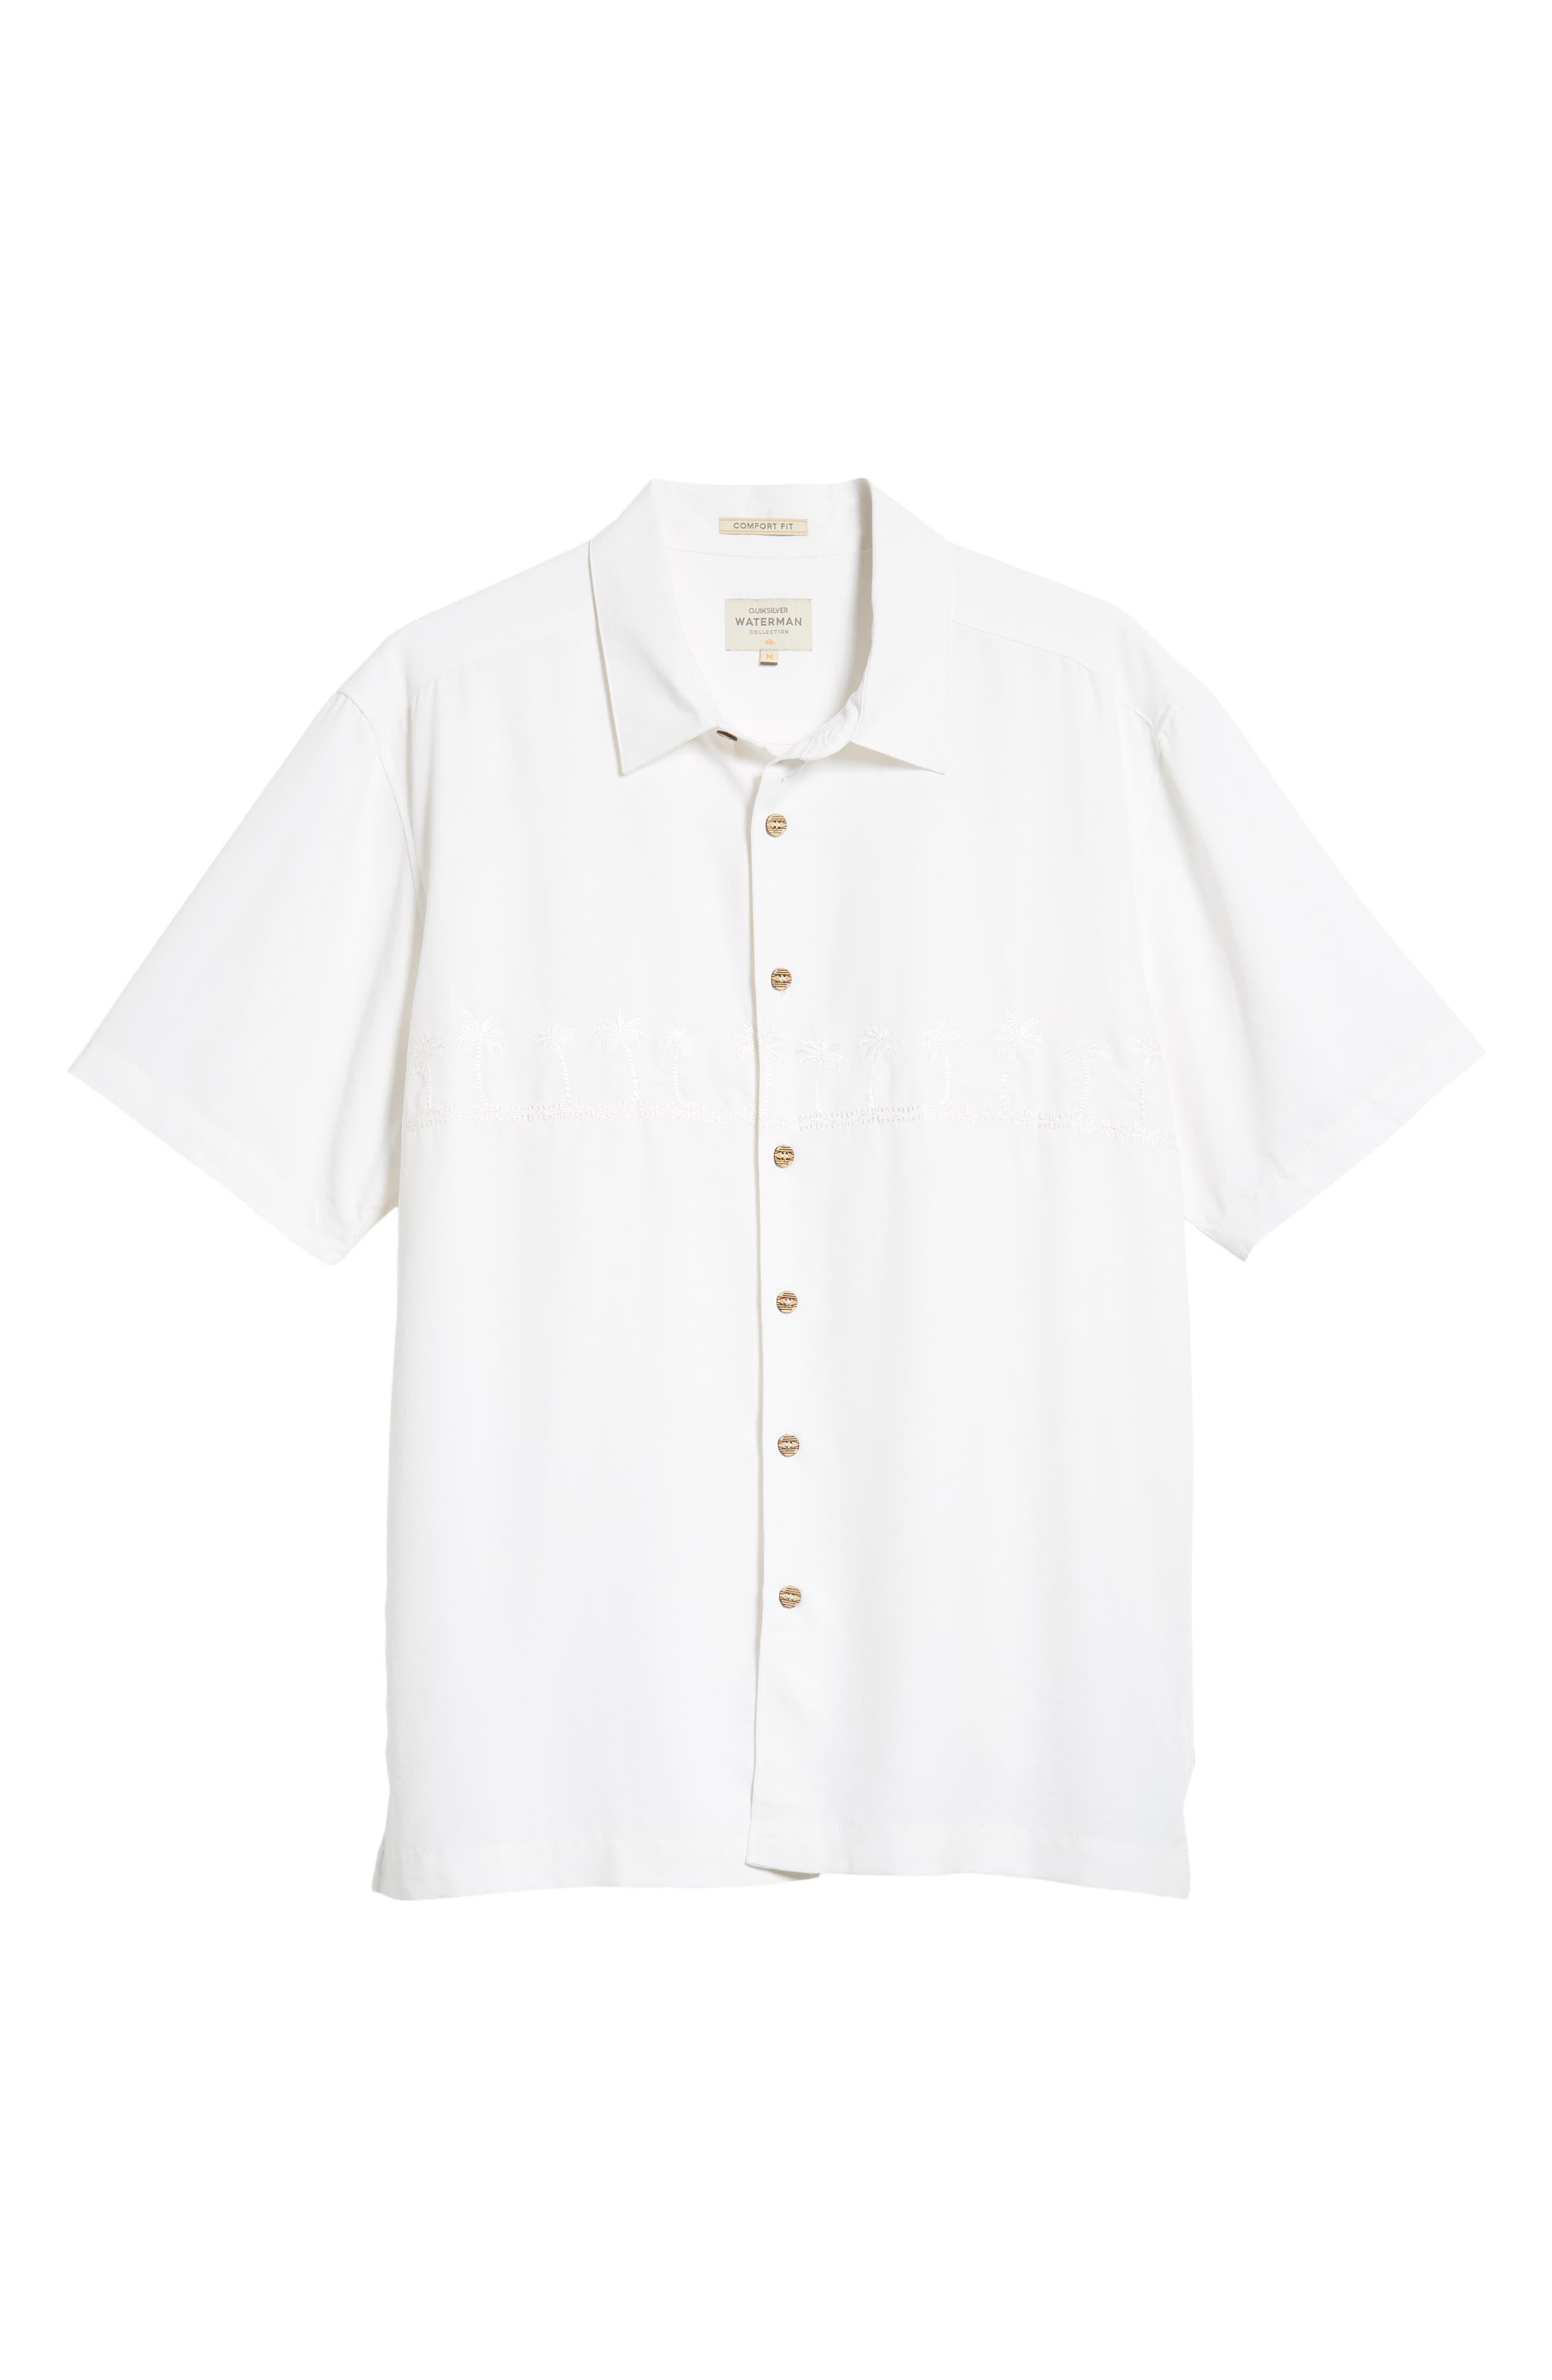 QUIKSILVER WATERMAN COLLECTION,                             Tahiti Palms Regular Fit Sport Shirt,                             Alternate thumbnail 5, color,                             WHITE